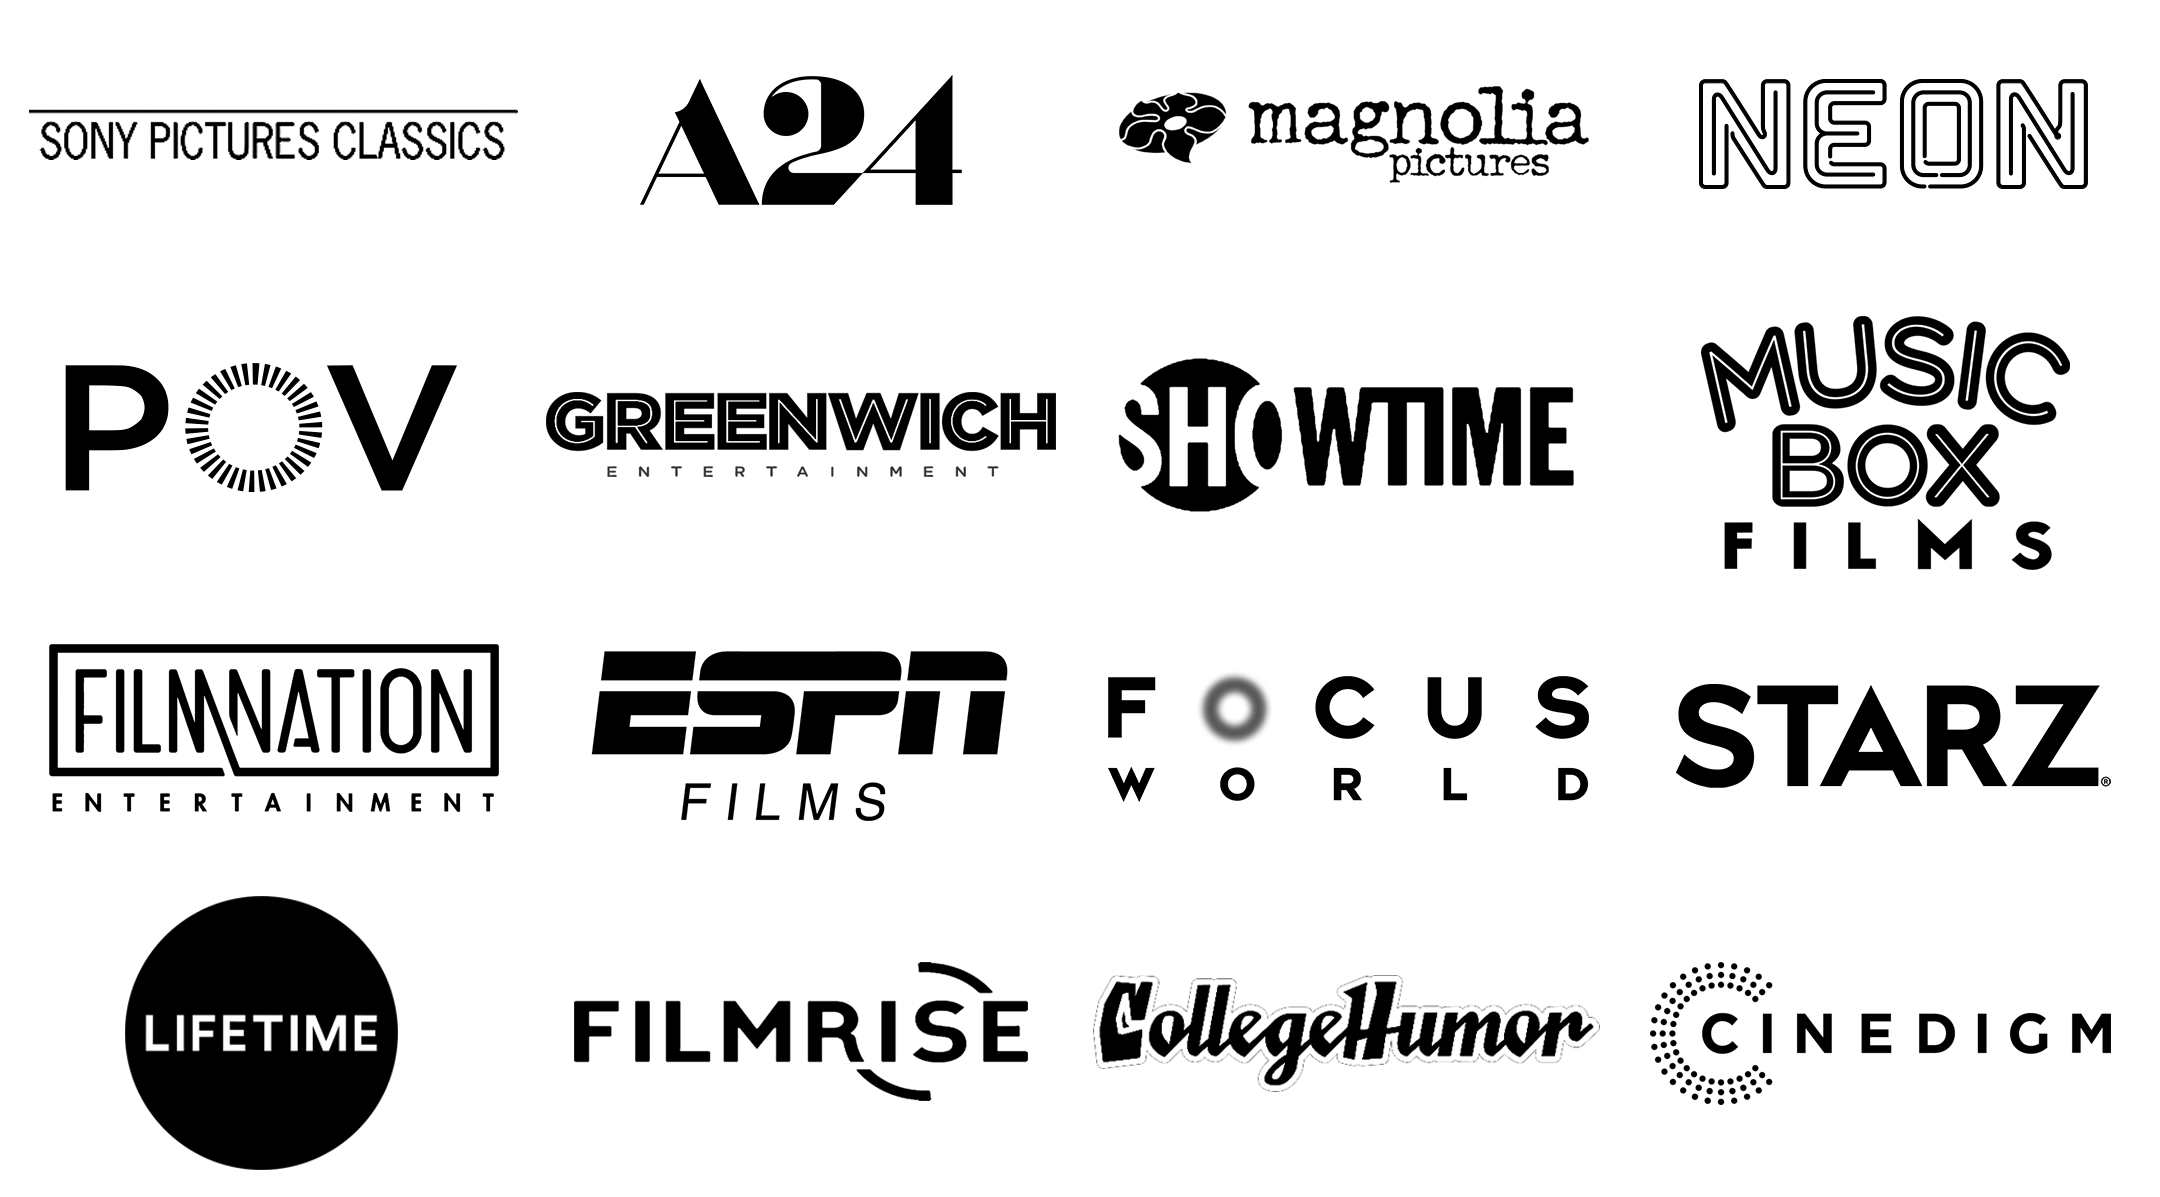 ClientLogoGrid_Horizontal_MASTER_01_20190515